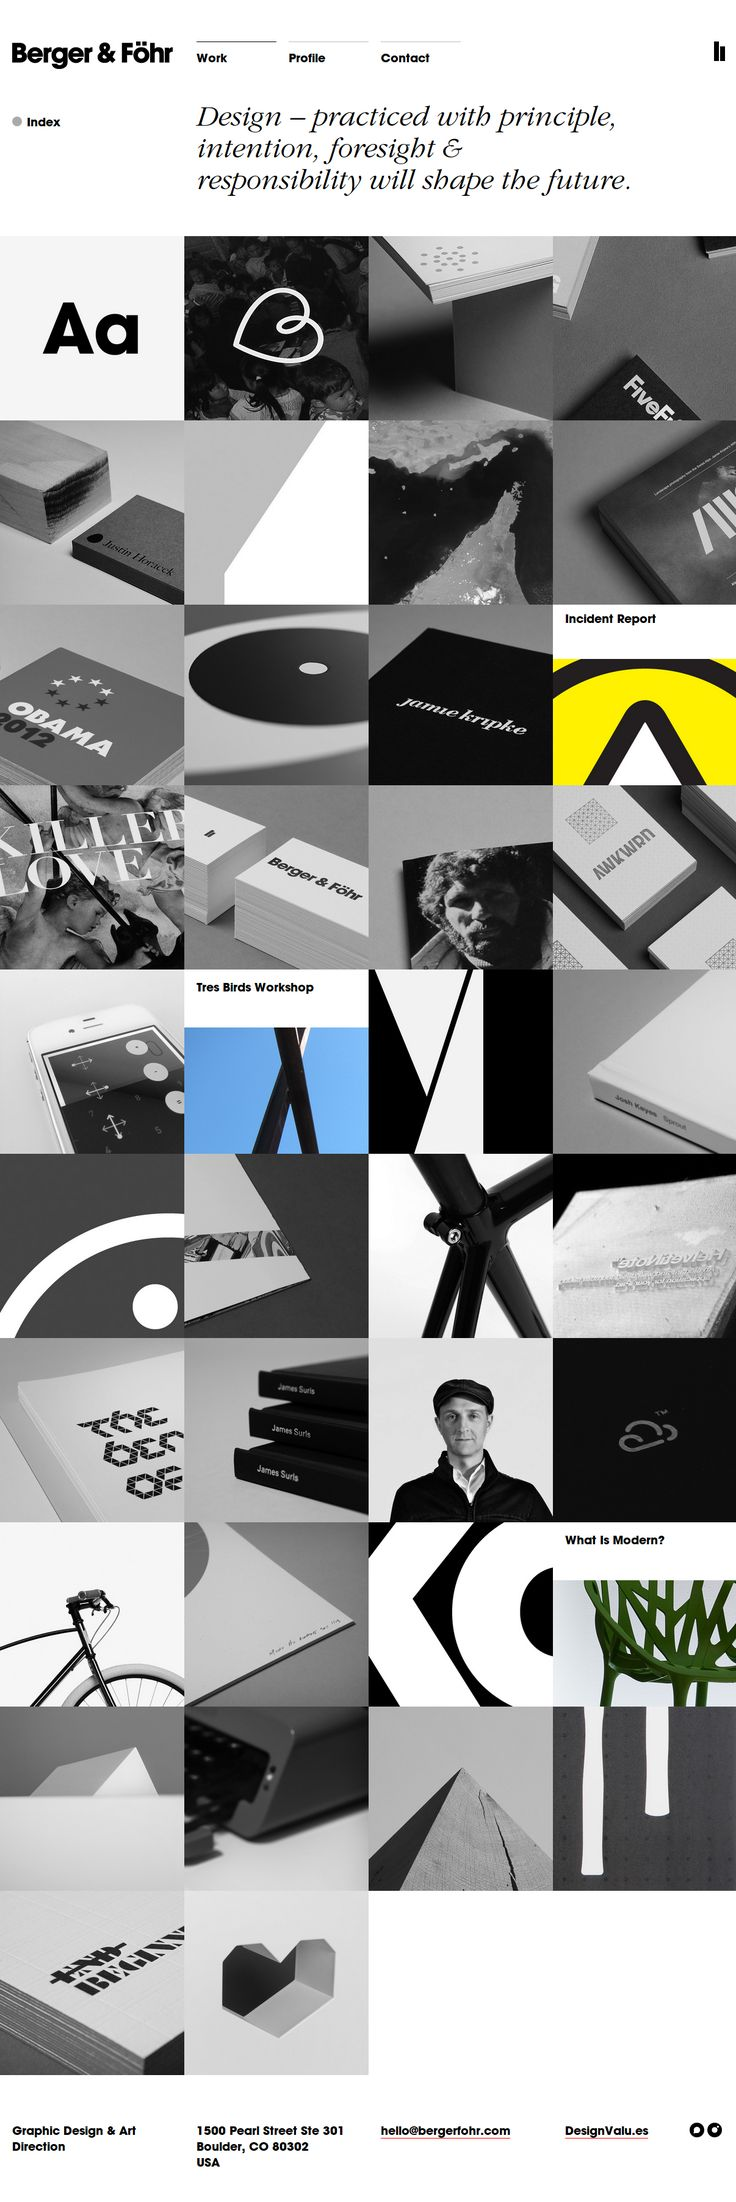 Berger & Föhr — Graphic Design & Art Direction http://www.awwwards.com/web-design-awards/berger-fohr